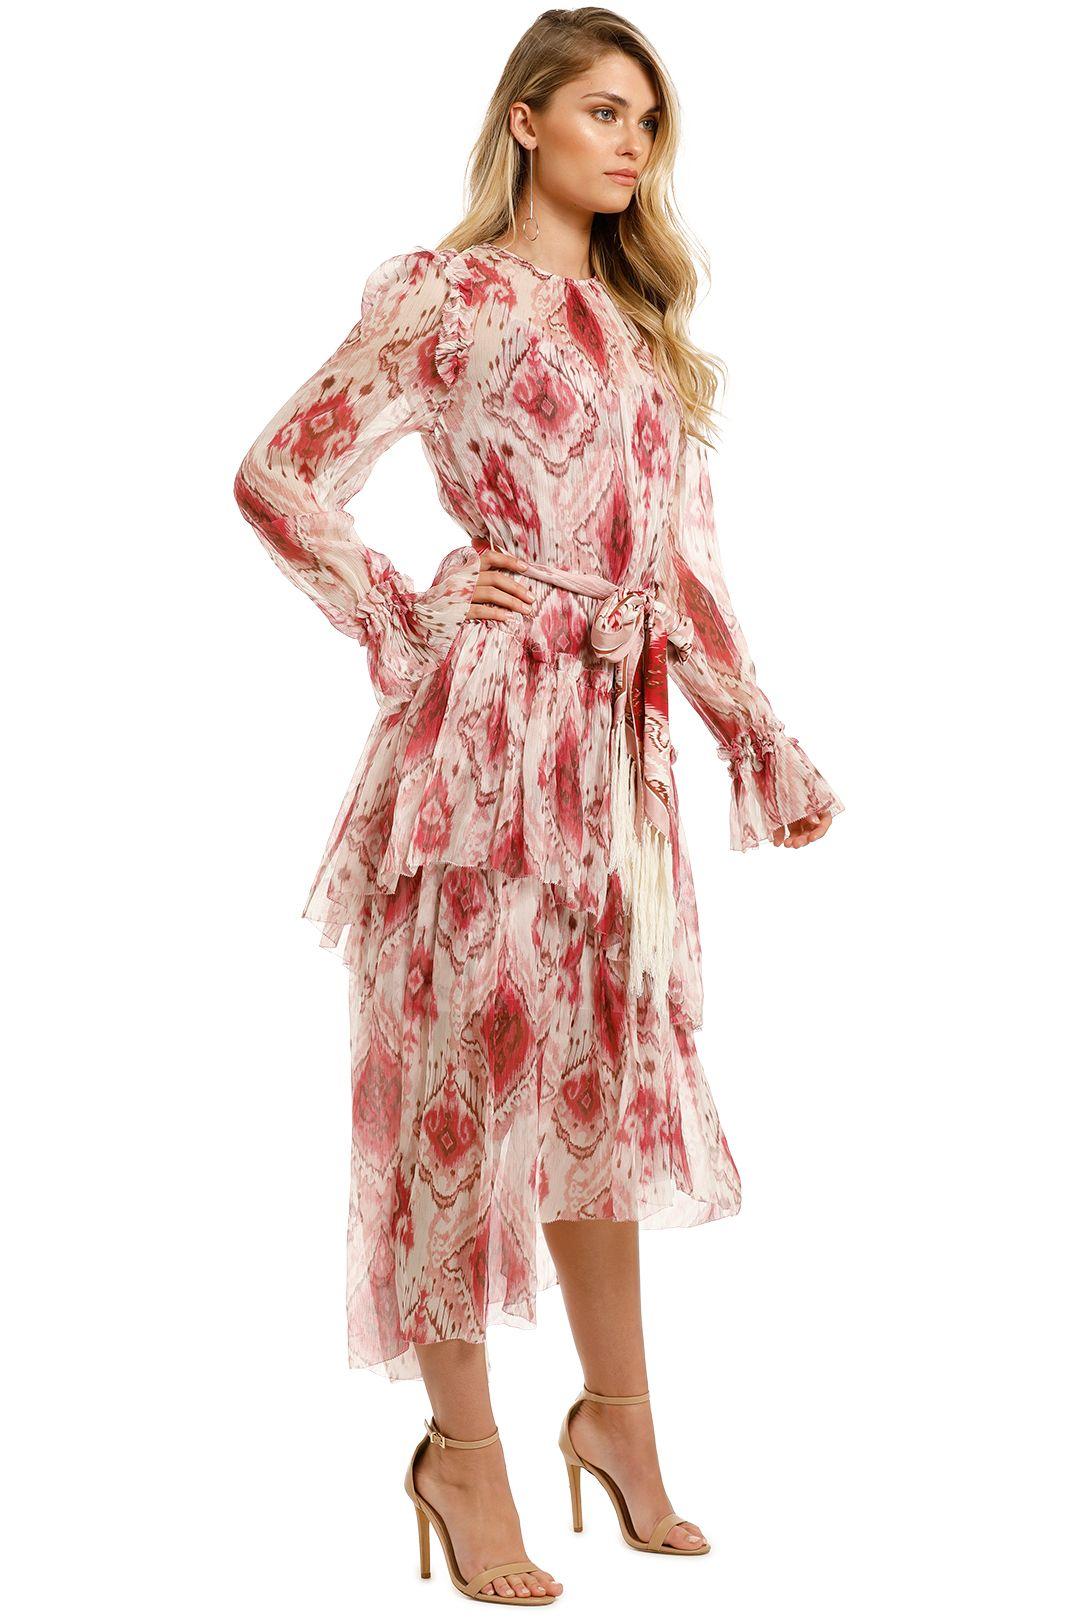 Zimmermann-Wavelength-Asymmetric-Dress-Raspberry-Ikat-Side